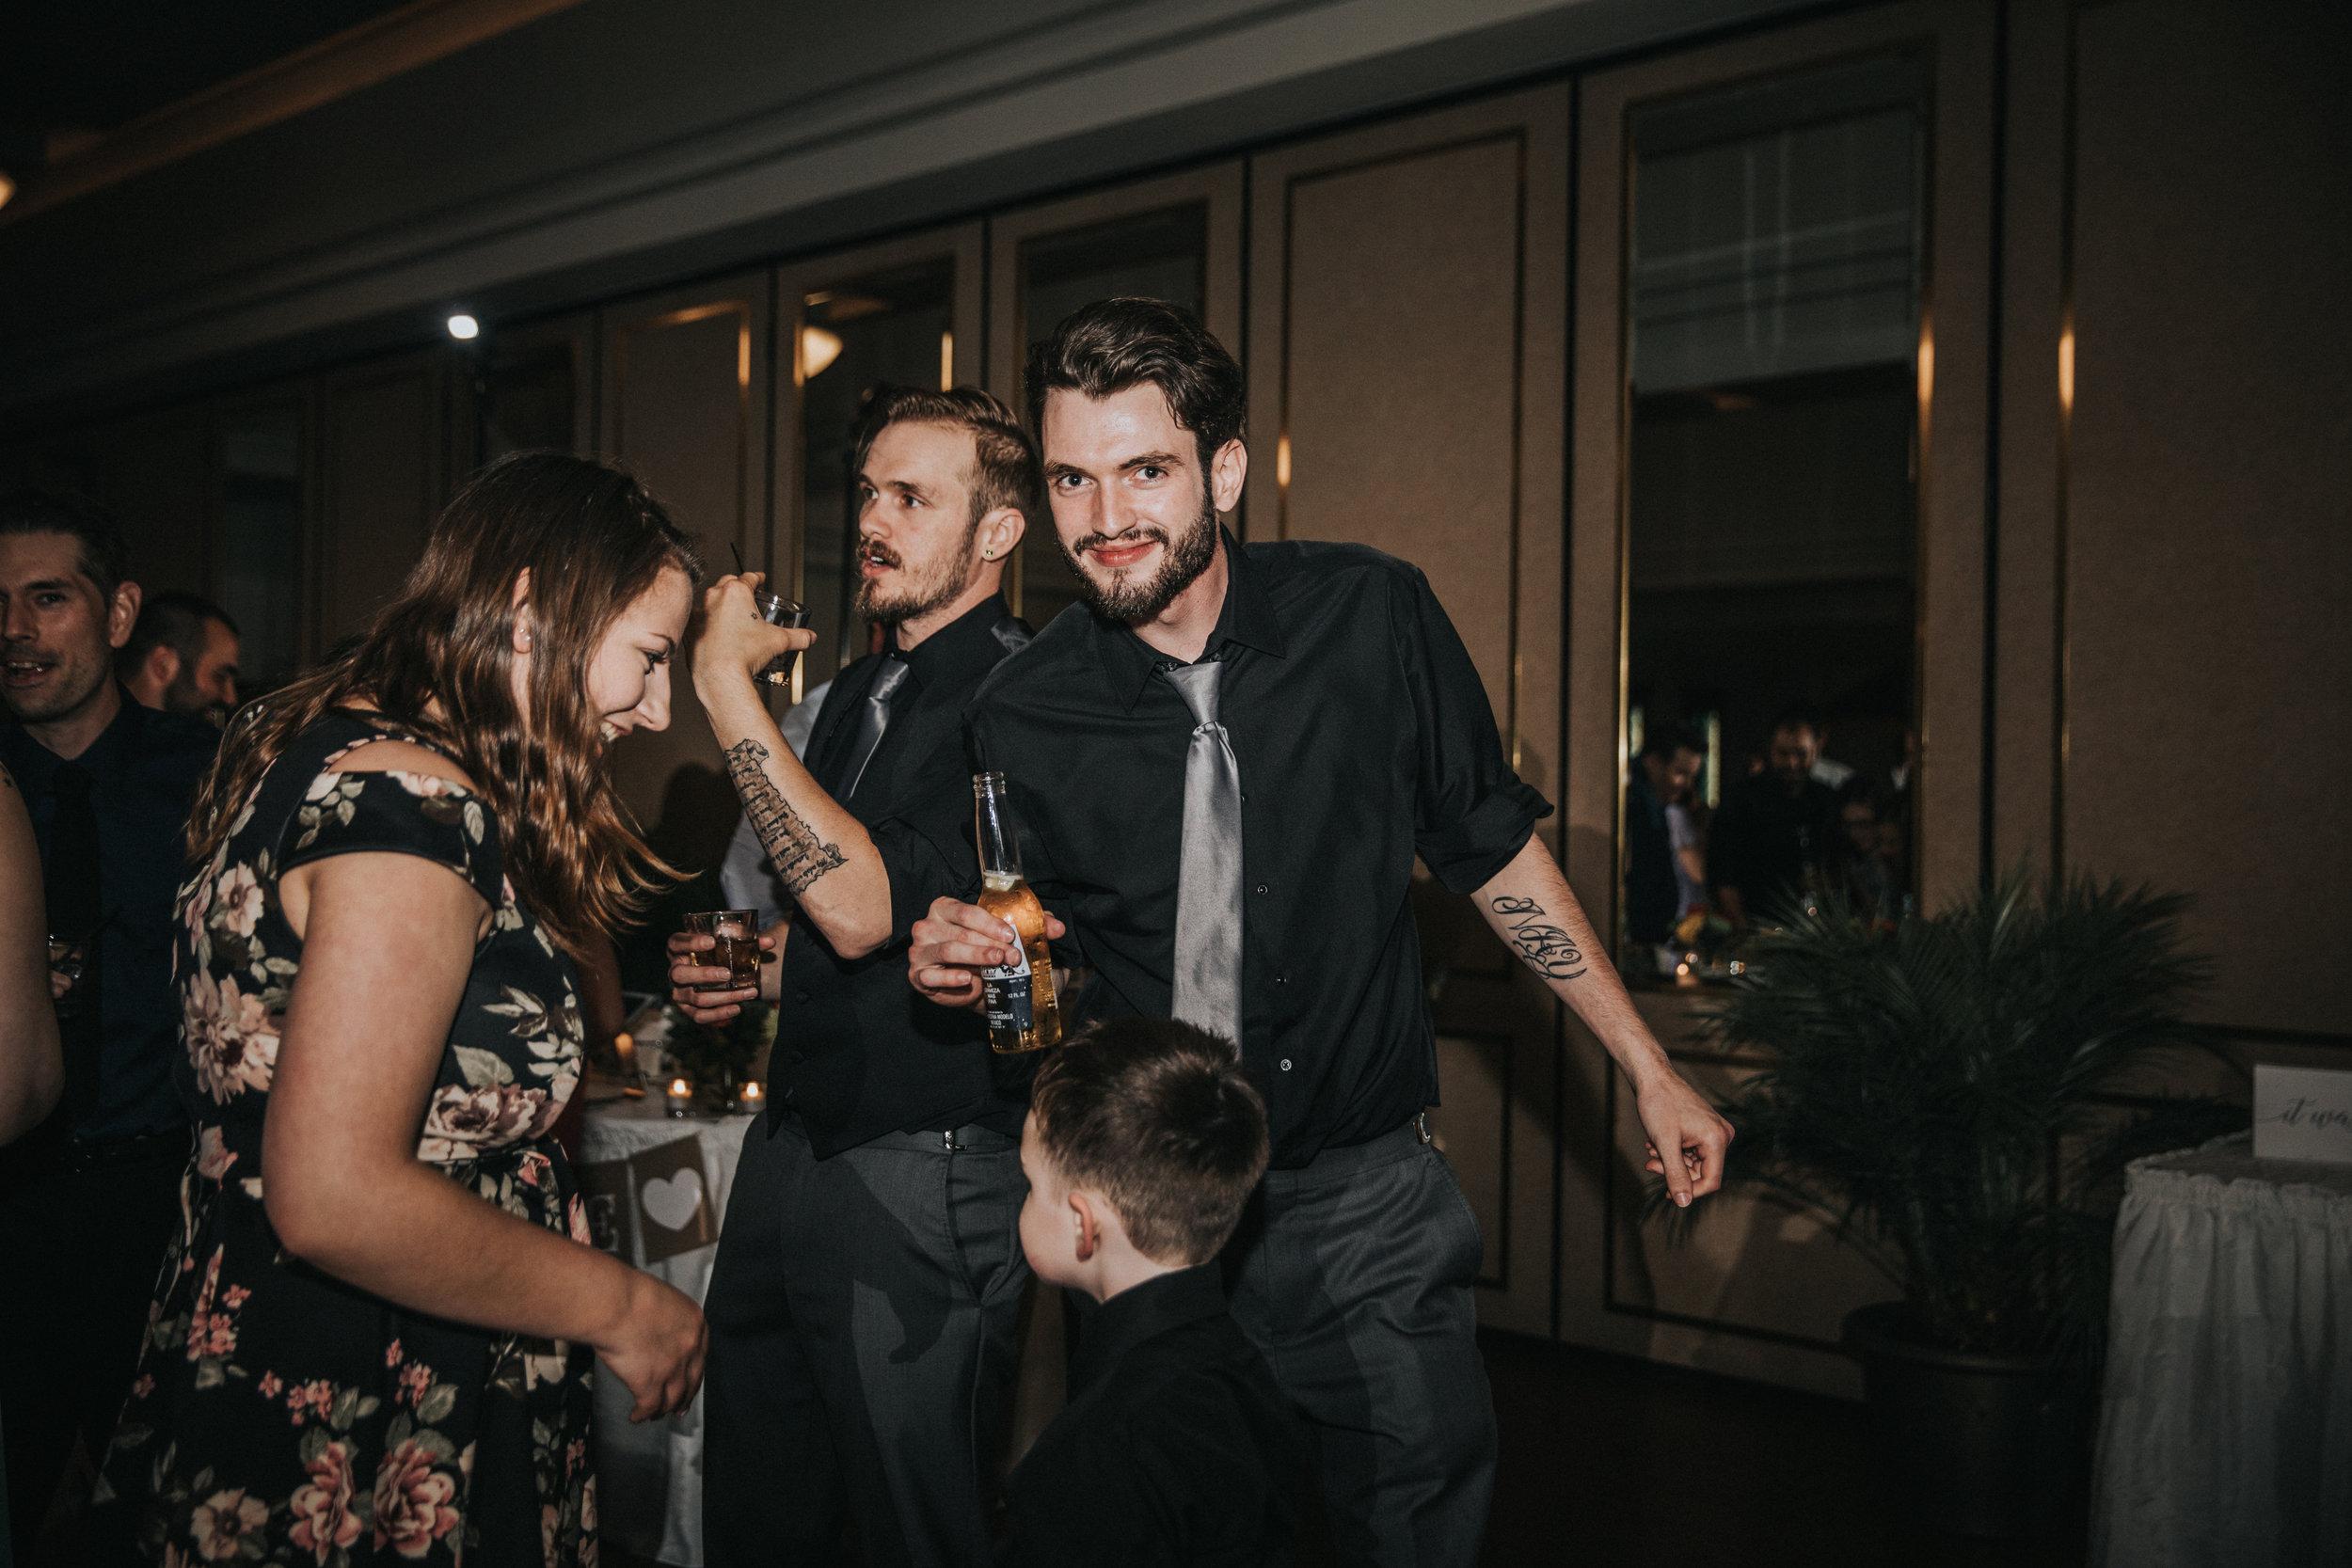 New-Jersey-Wedding-Photographer-Megan&Nick-Reception-117.jpg